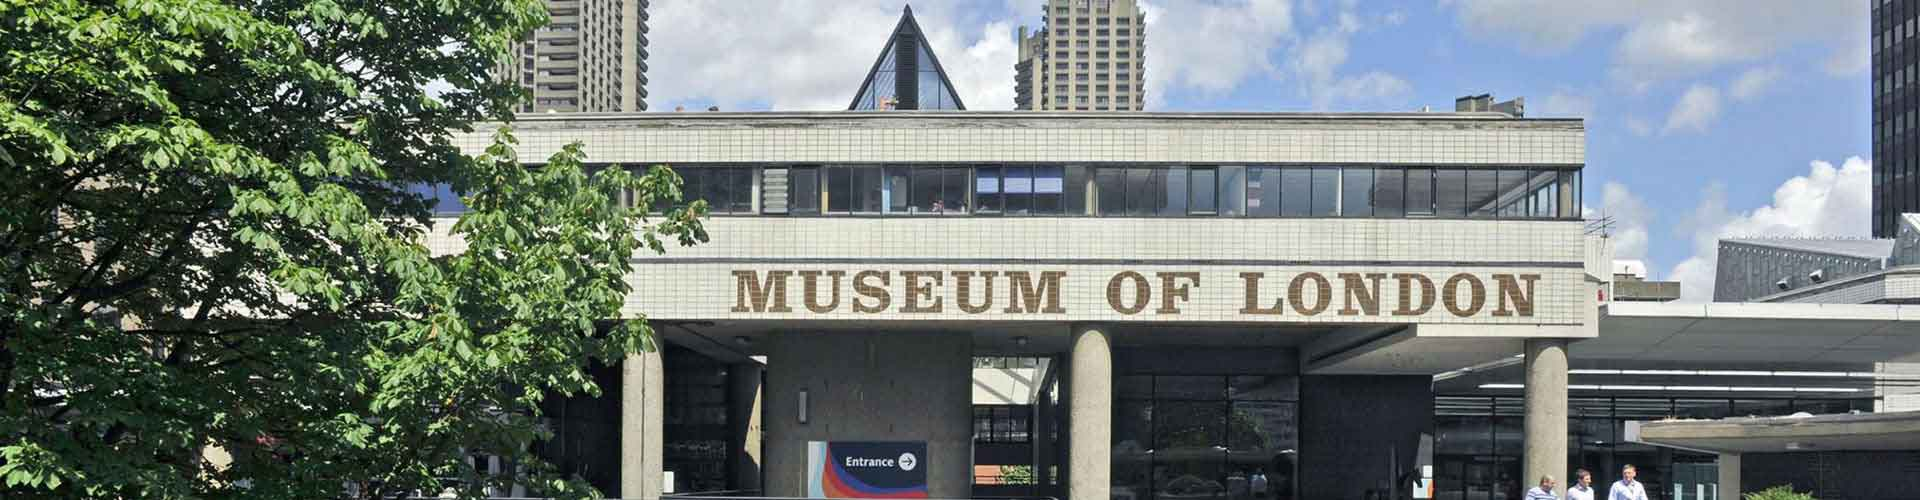 Londres - Albergues Juveniles cerca a Museo de Londres. Mapas de Londres, Fotos y Comentarios para cada Albergue Juvenil en Londres.